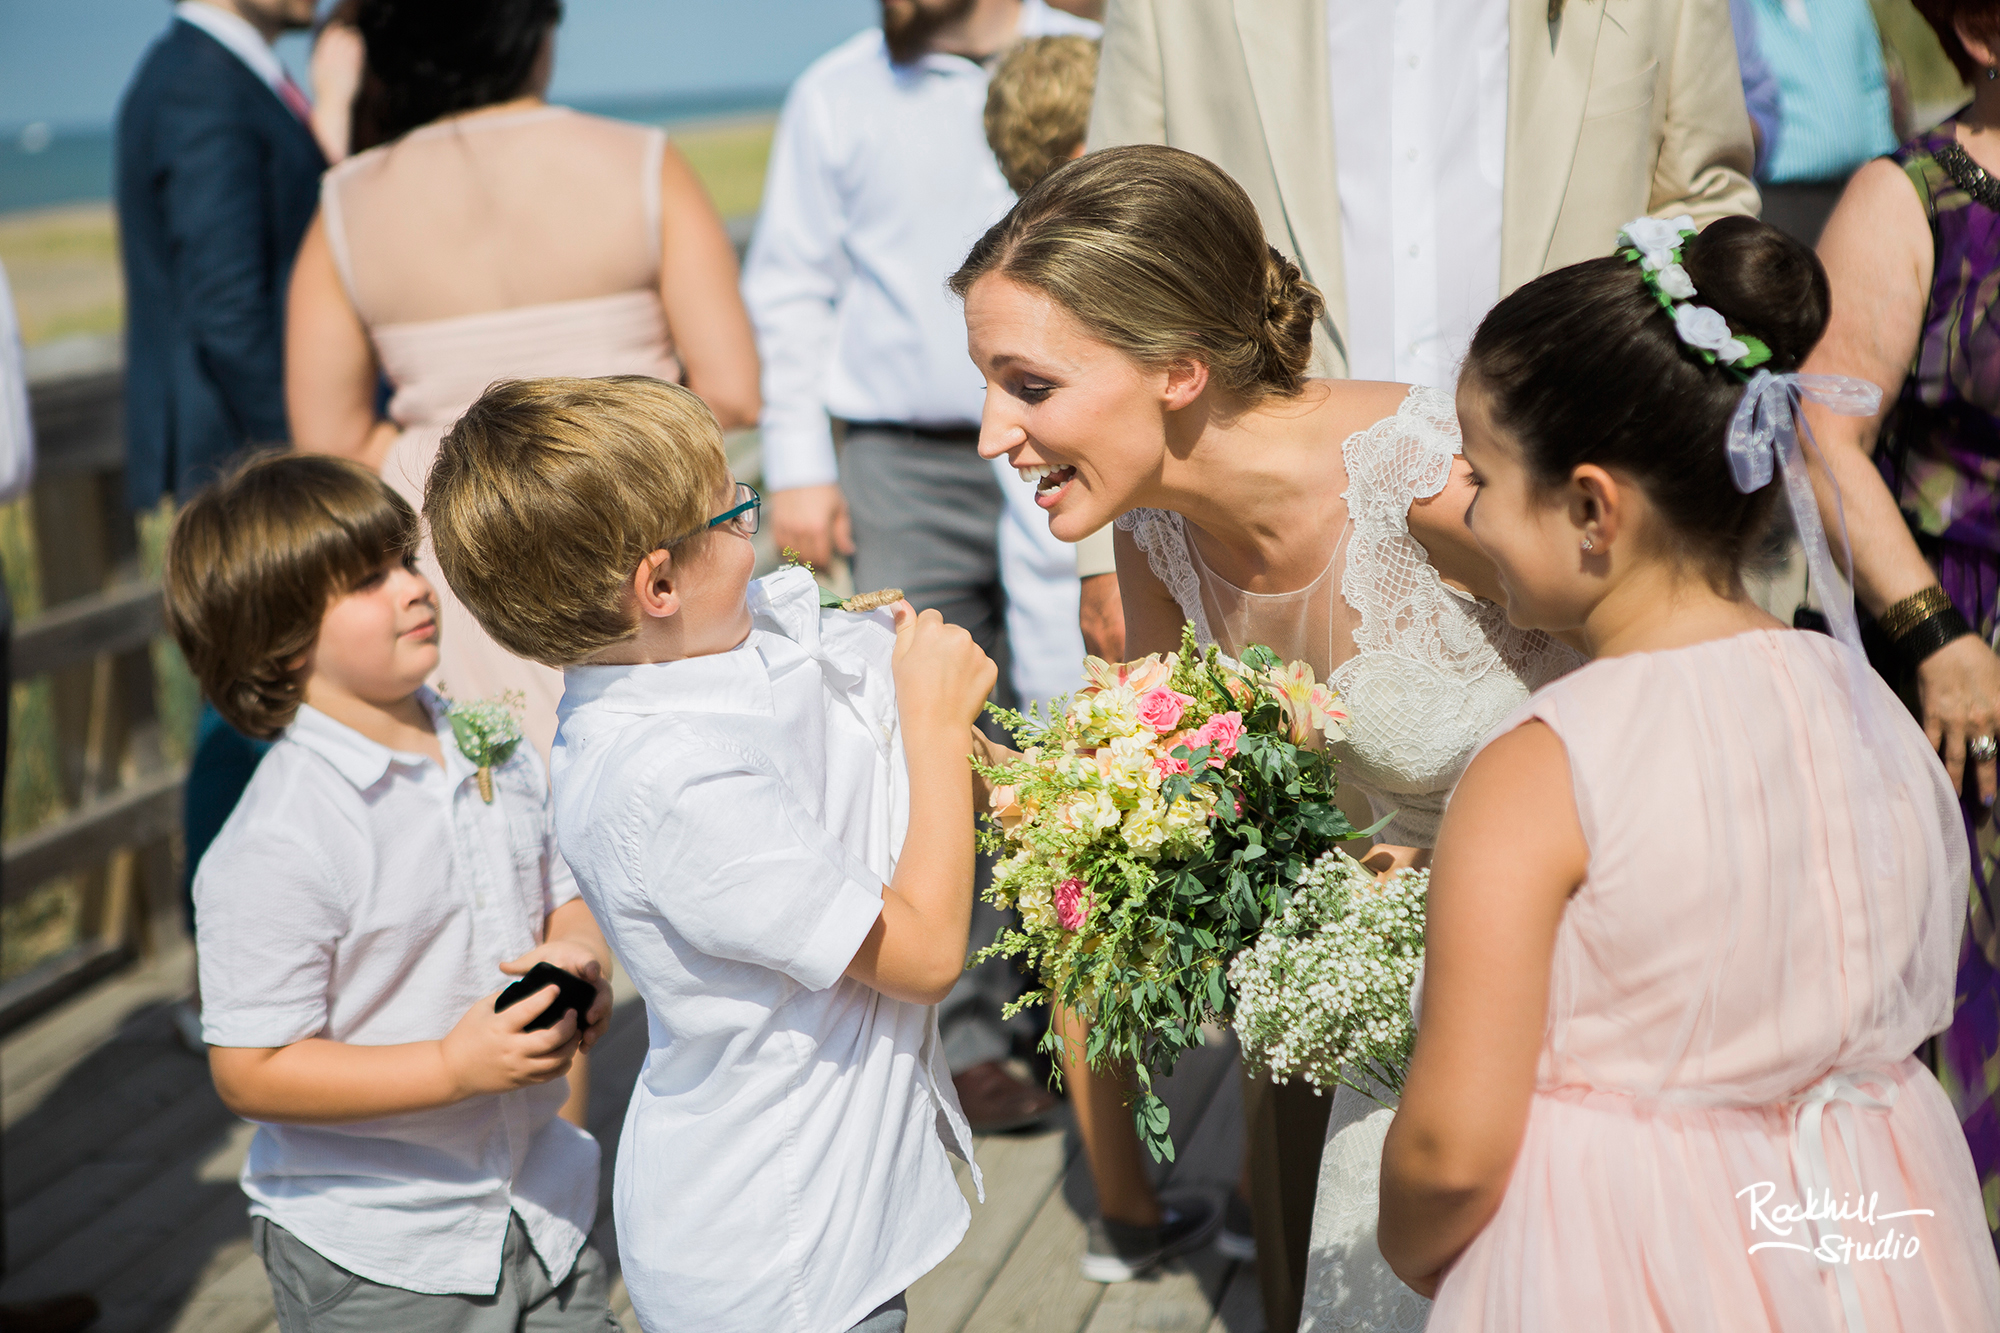 grand-marais-wedding-photography-upper-peninsula-northern-michigan-rockhill-40.jpg